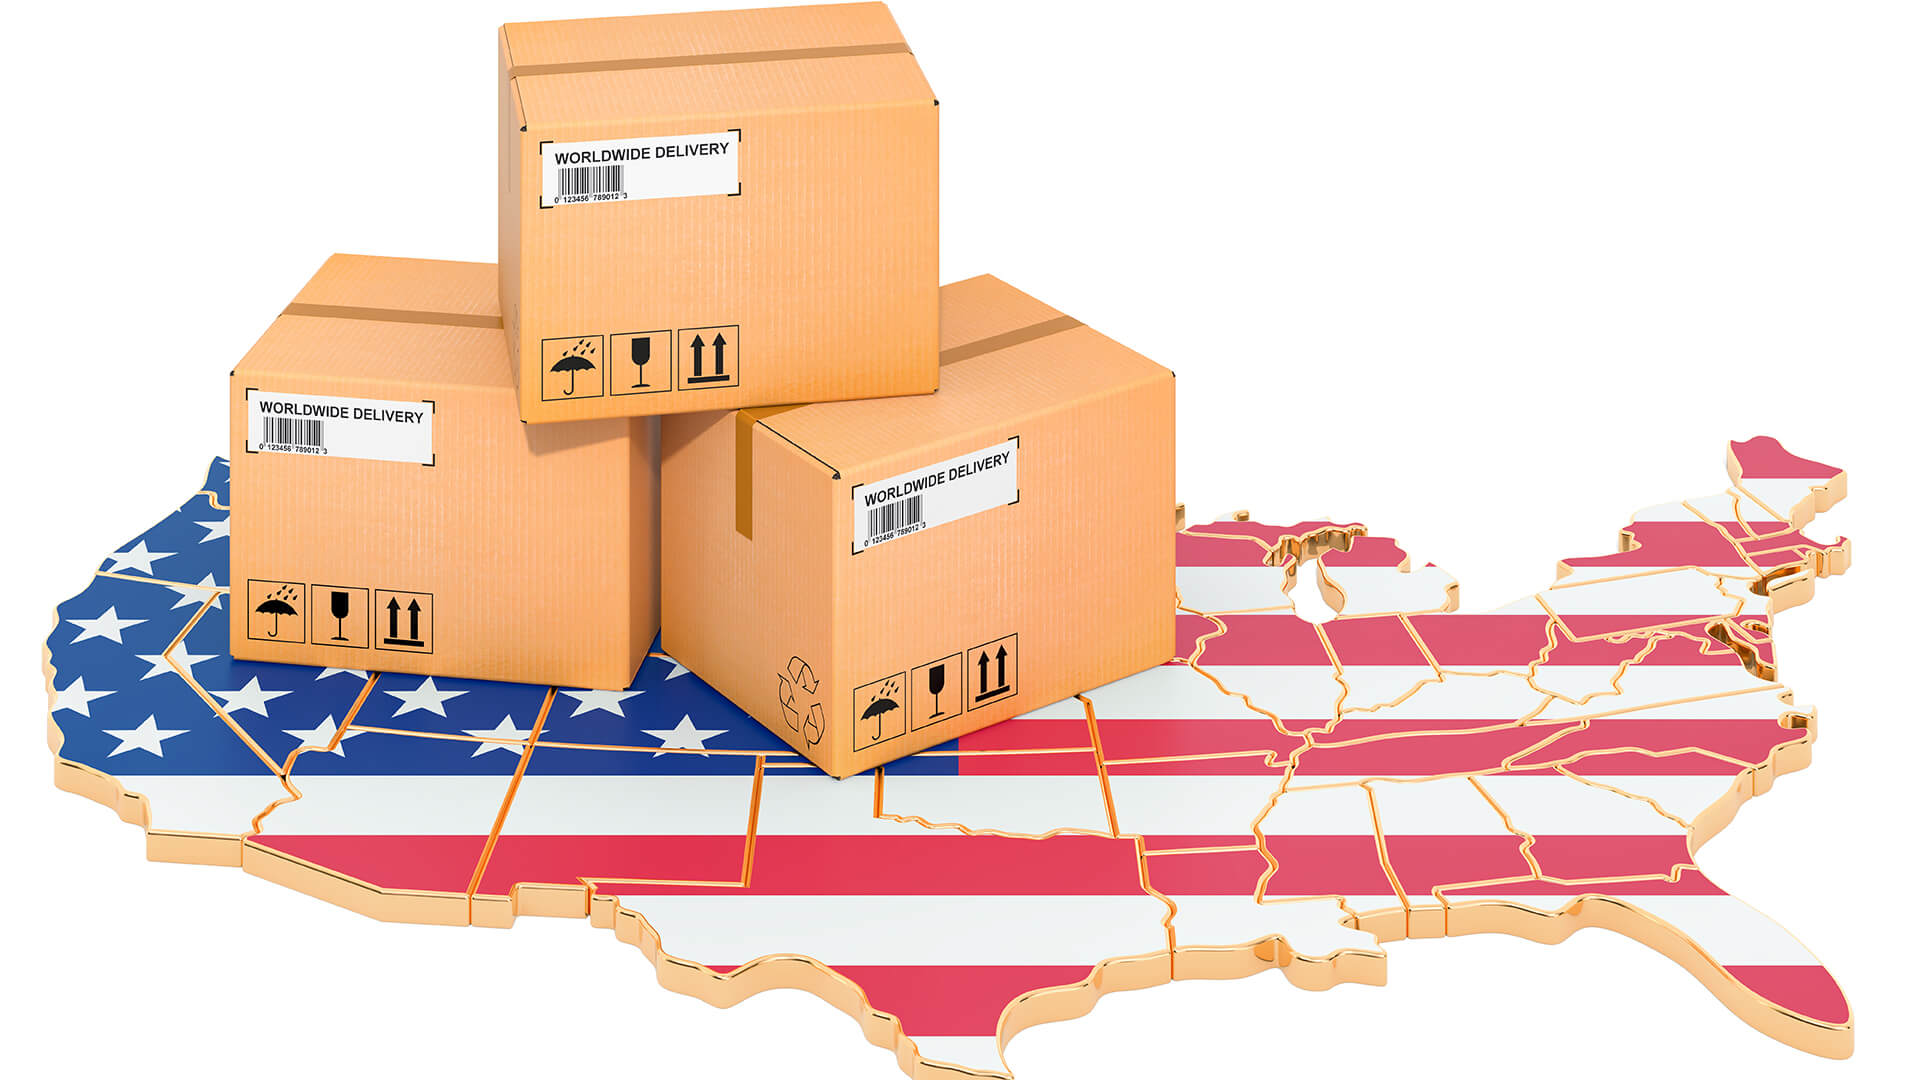 Delivery parcels